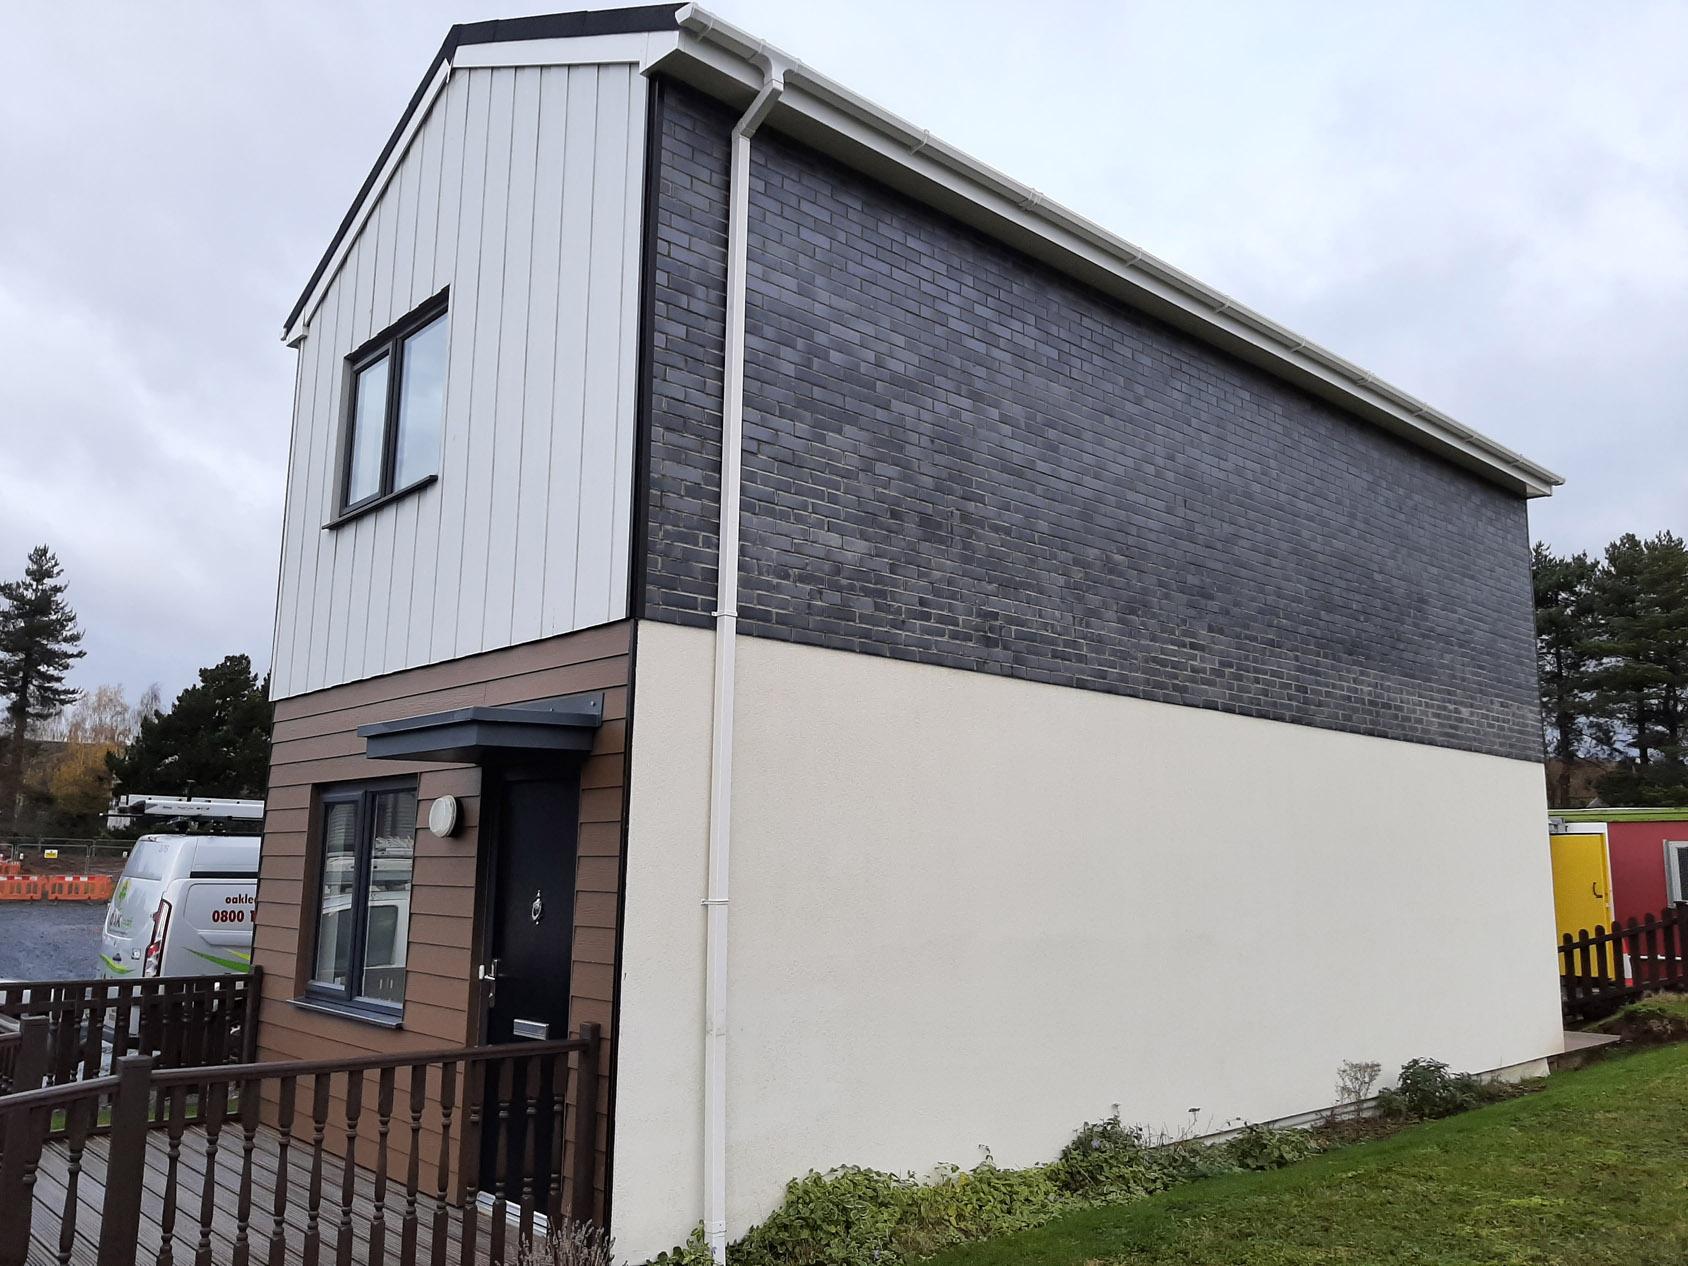 Procurement consortium changes name to Communities and Housing Investment Consortium